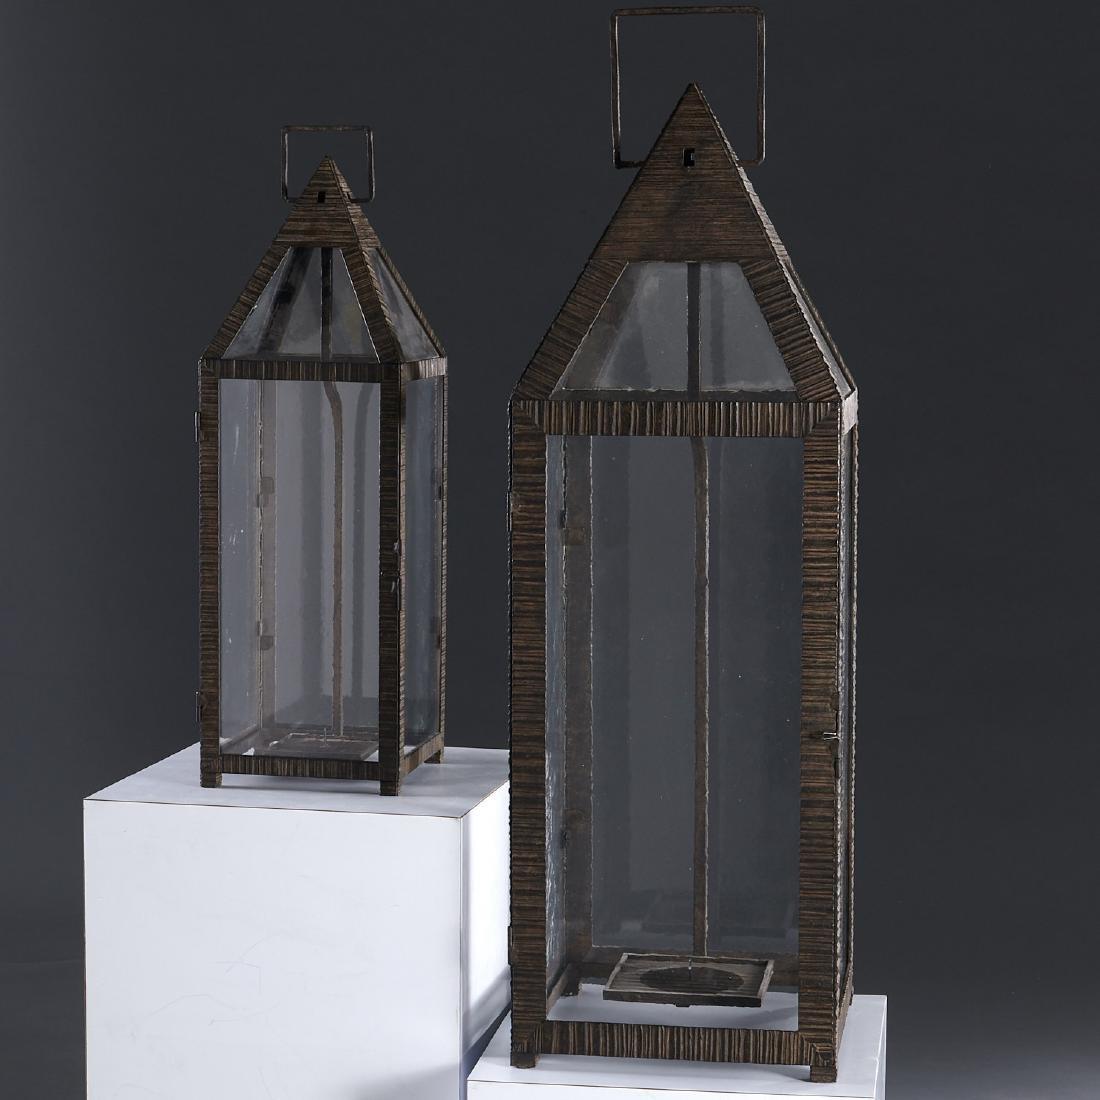 (2) WP Sullivan (attib.) designer hanging lanterns